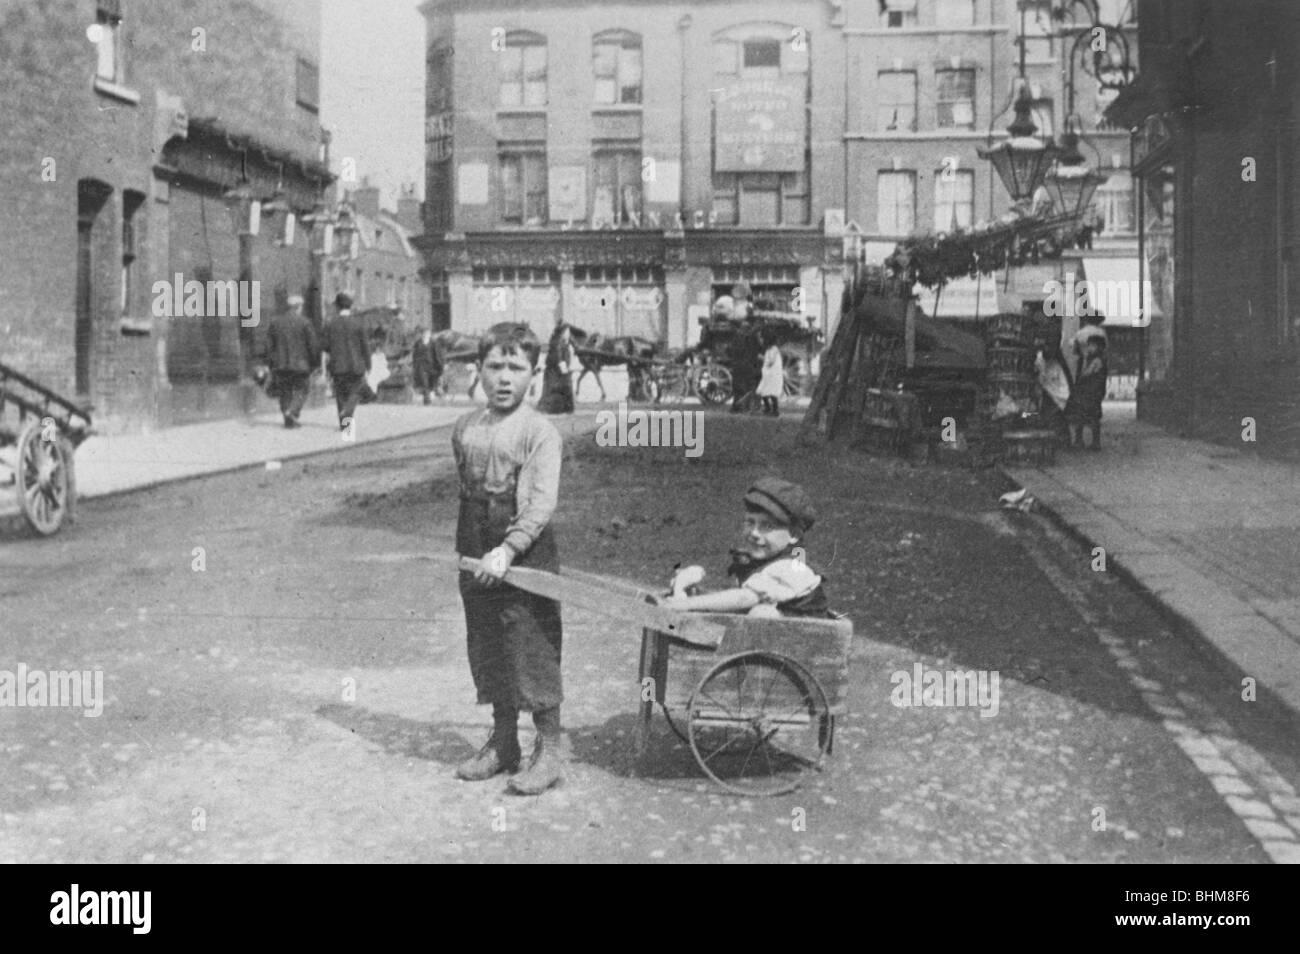 East End children, London, c1900. - Stock Image